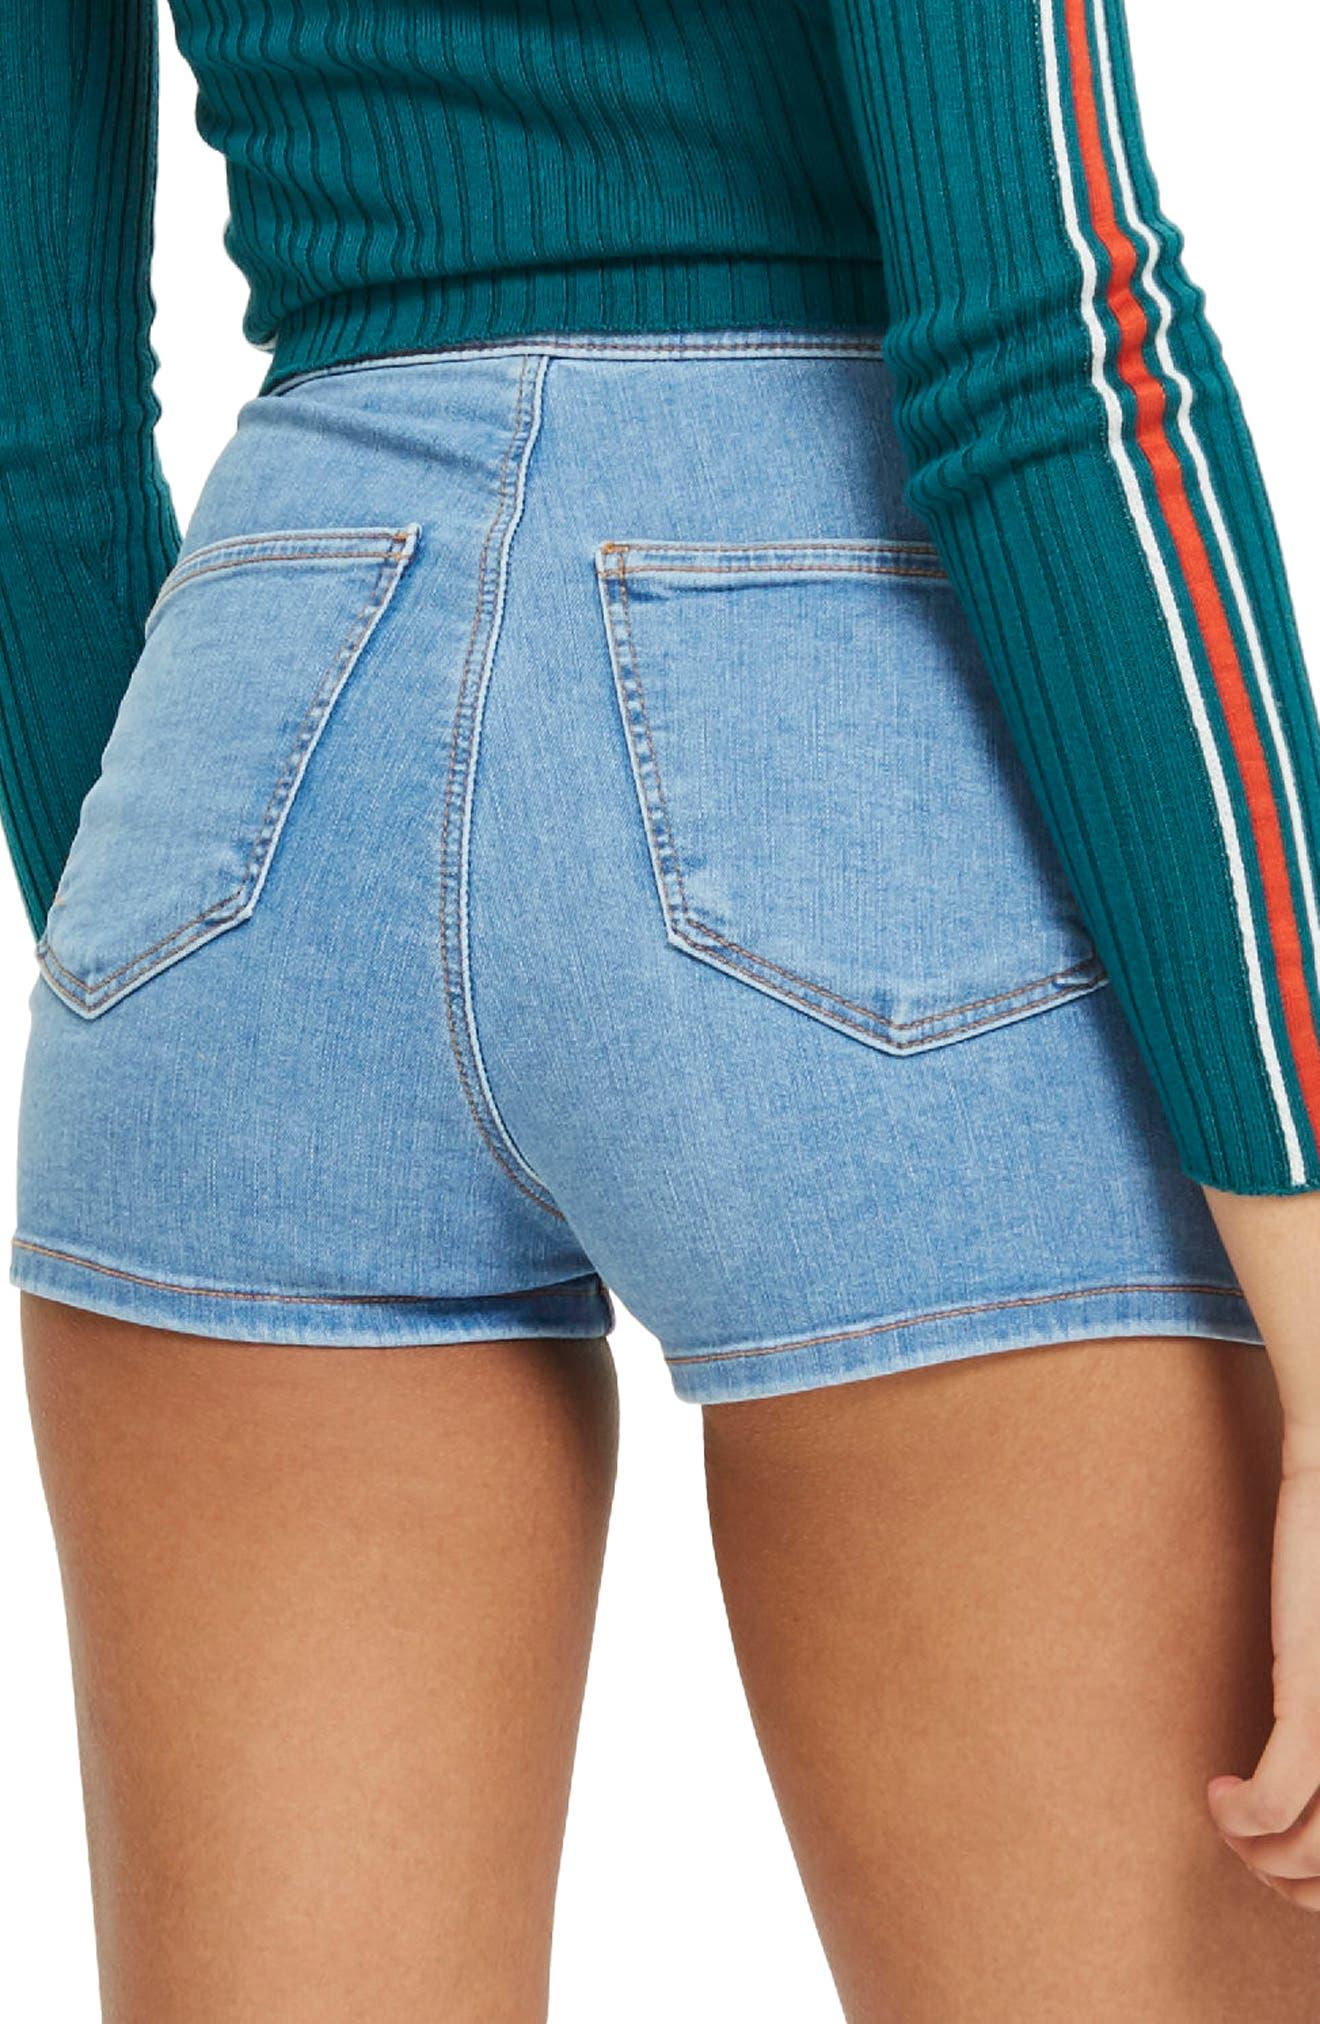 Joni Light Denim High Waist Shorts,                             Alternate thumbnail 3, color,                             Light Denim